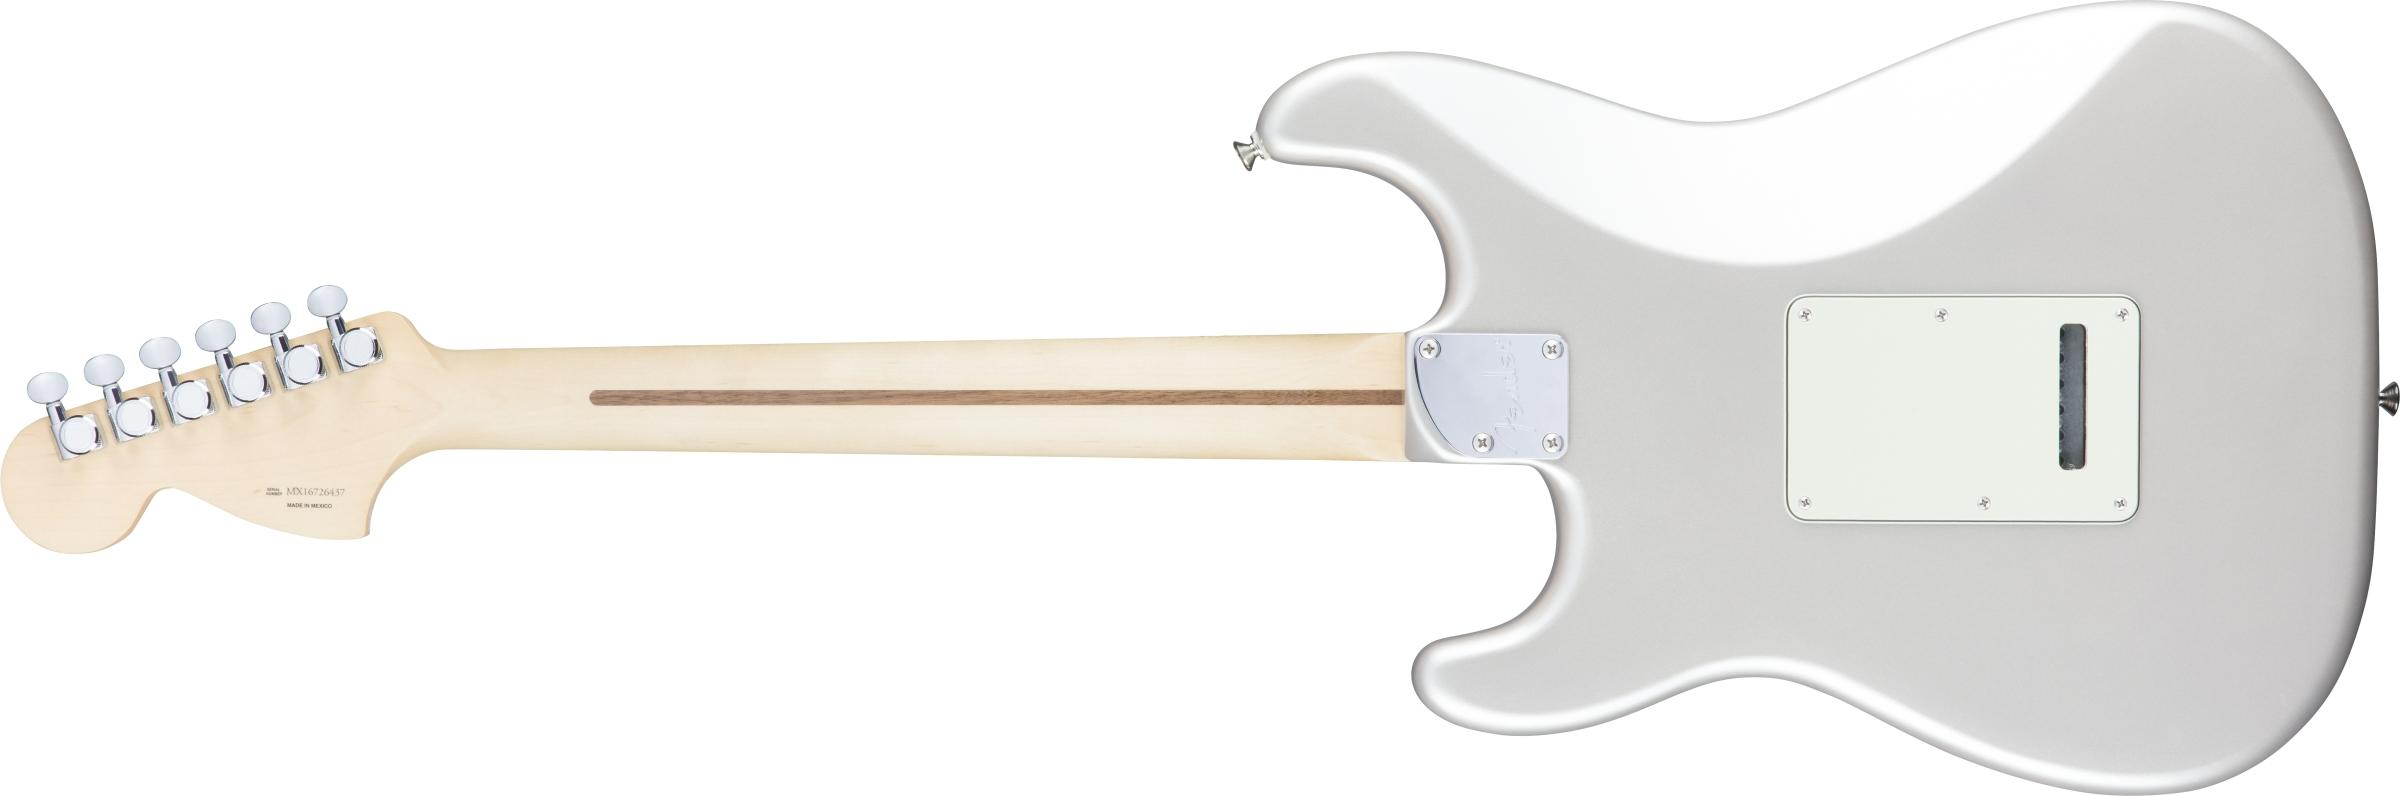 fender stratocaster deluxe hss wiring diagram bt master socket 5c mk4 maple fingerboard